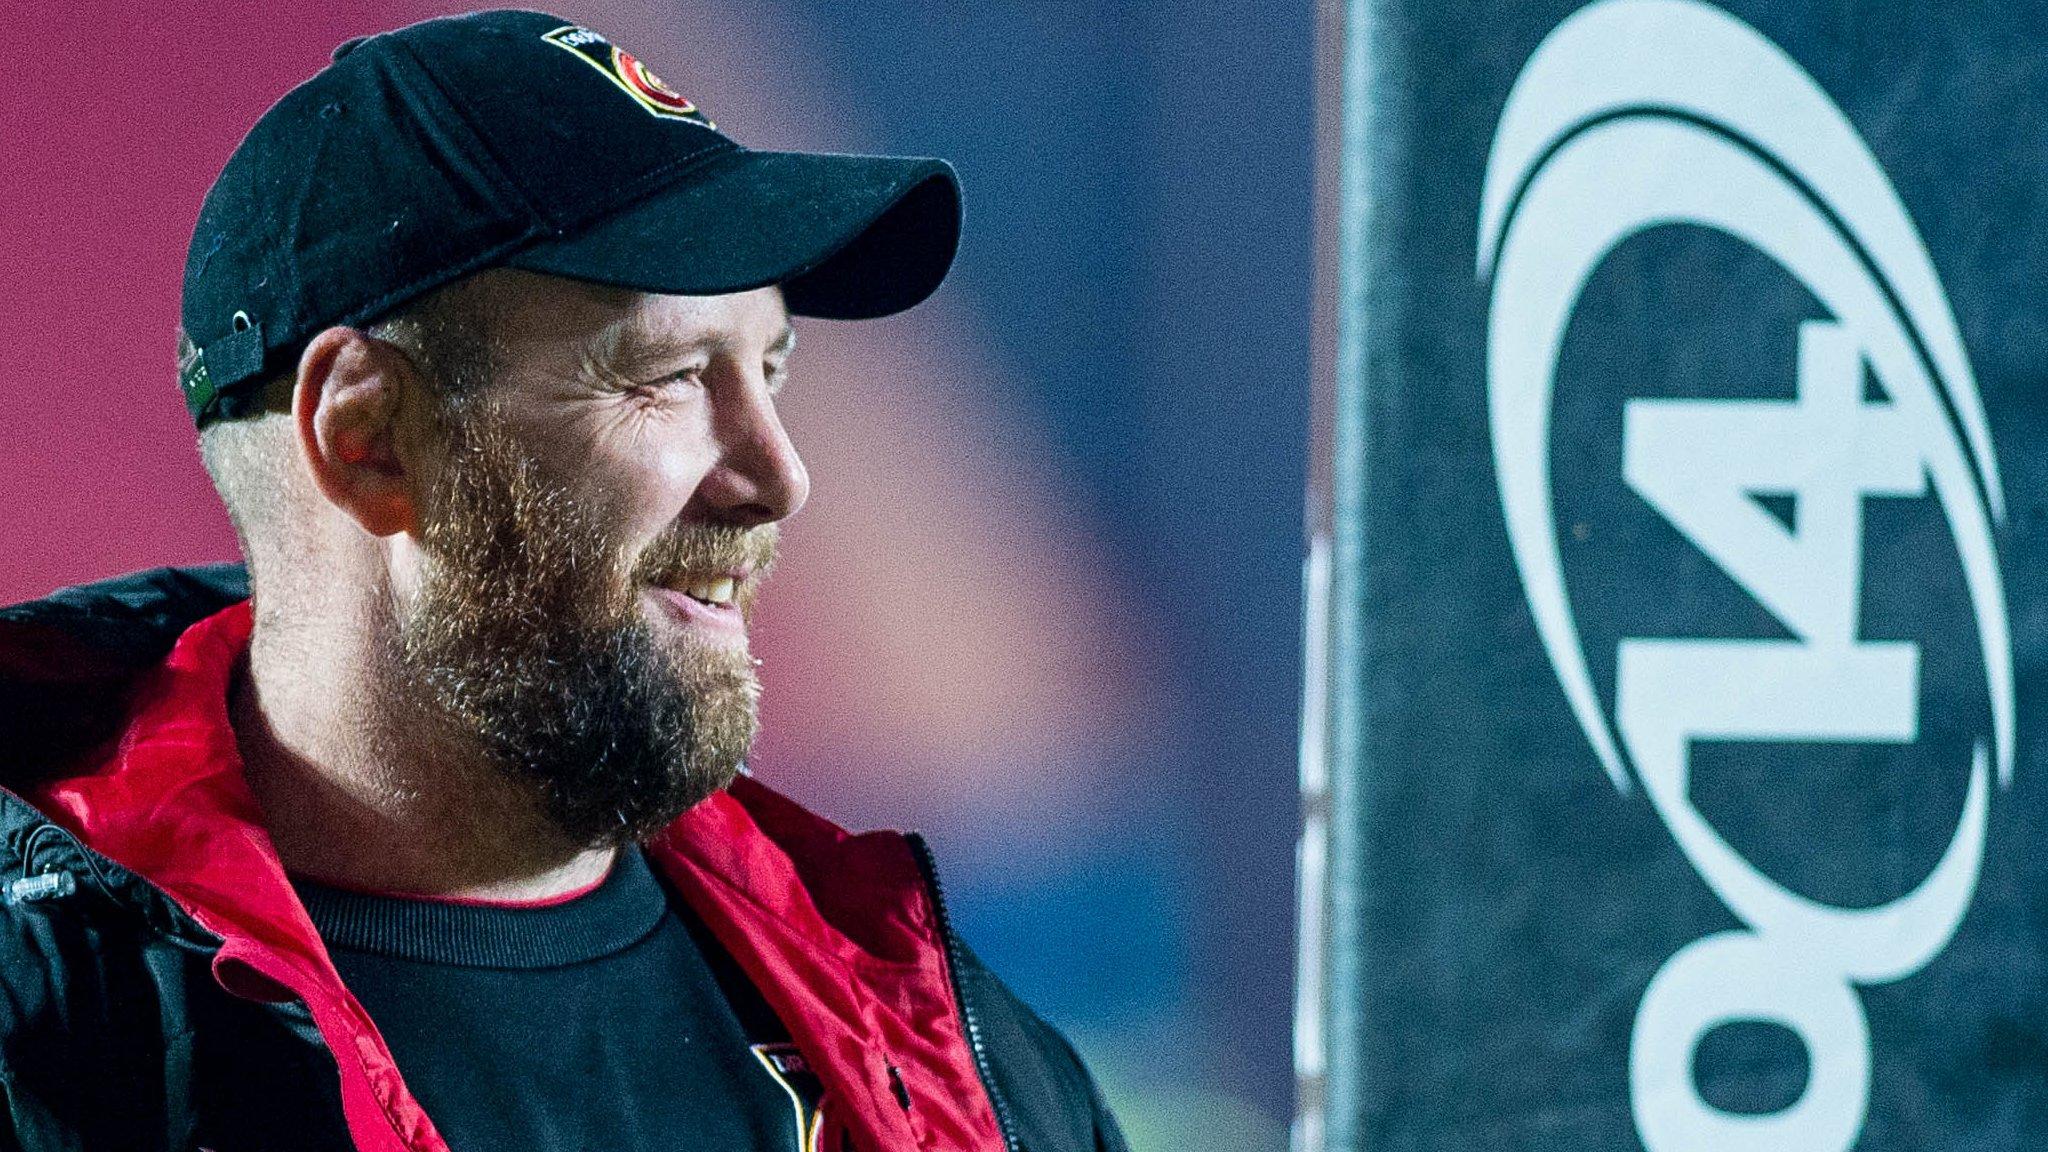 Pro14: Ceri Jones to remain Dragons coach to end of 2018-19 season